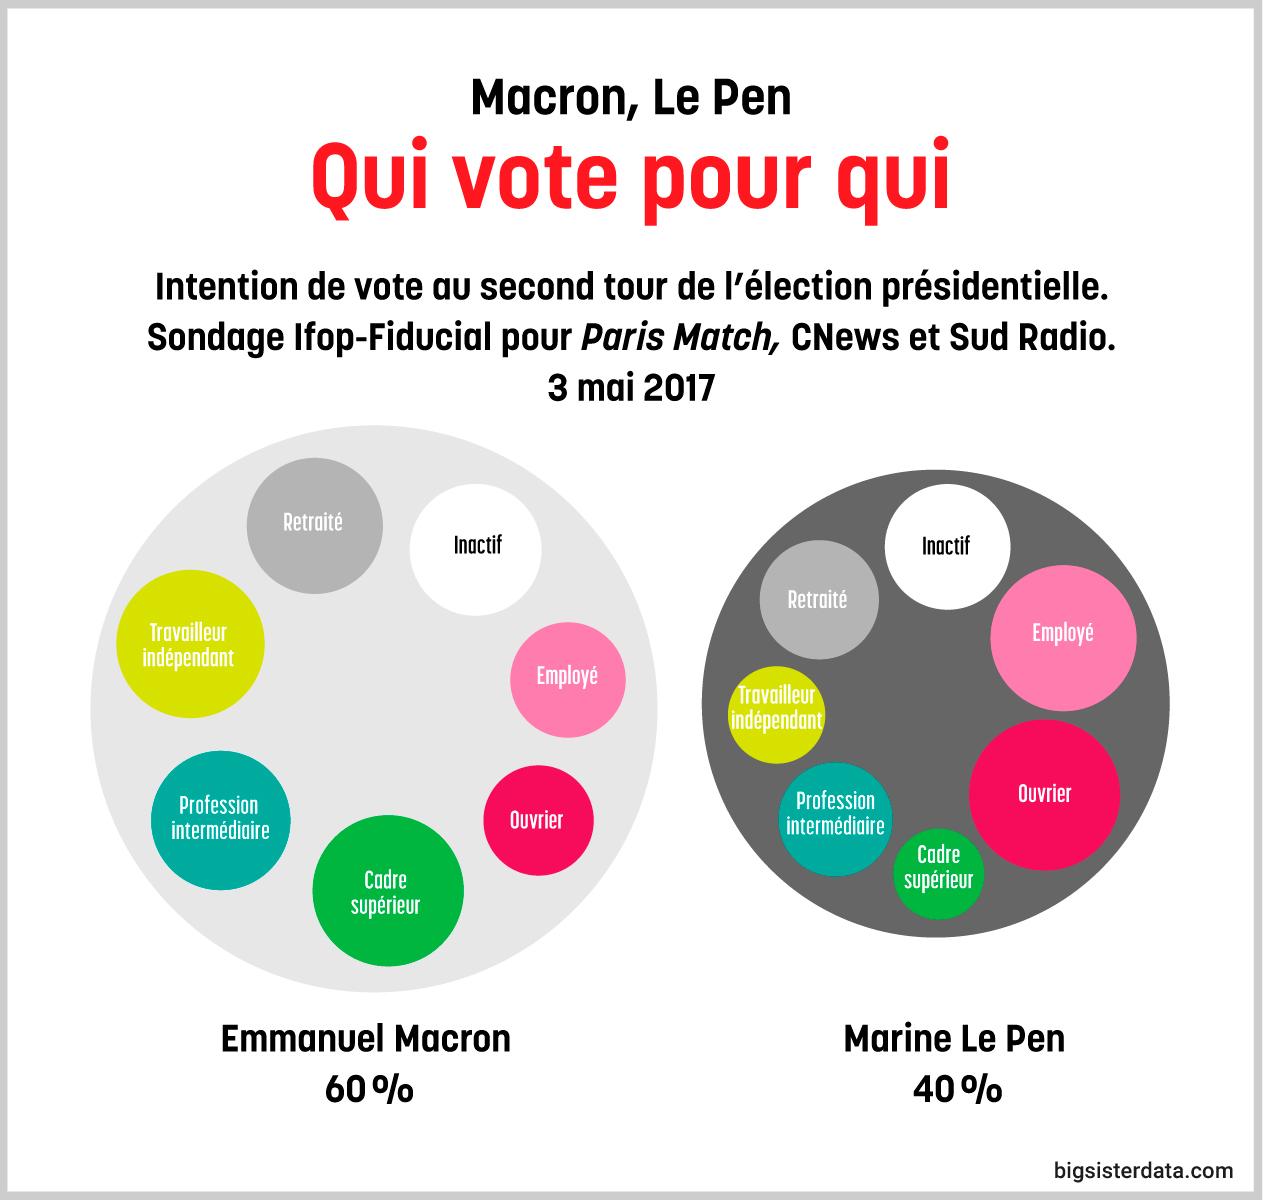 Macron, Le Pen